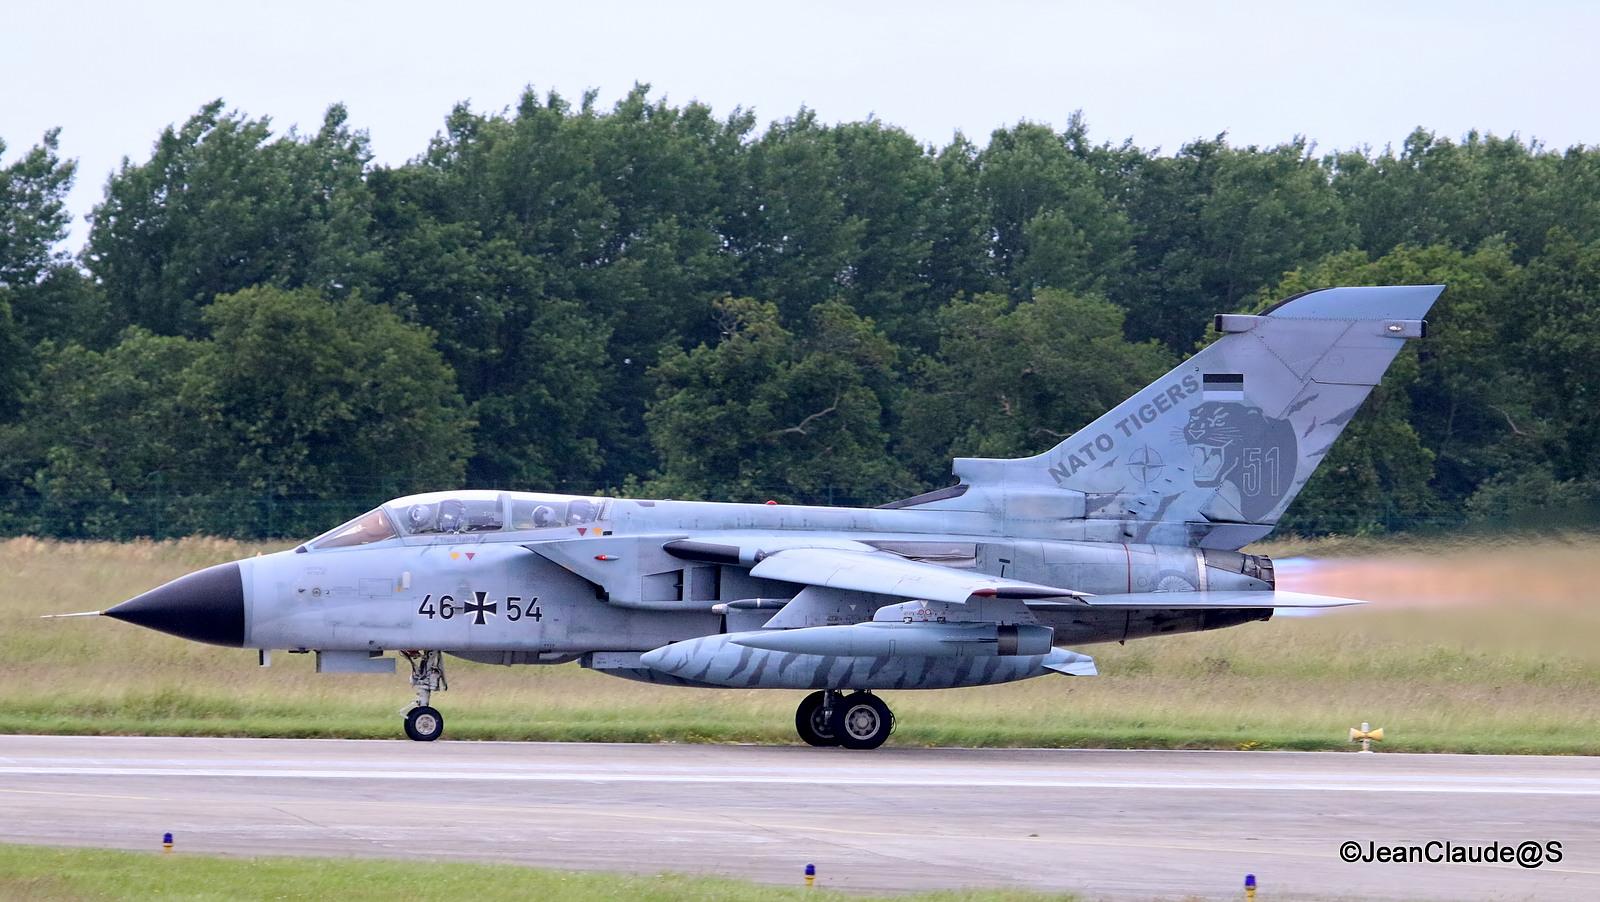 NATO Tiger Meet 2017 Landivisiau Img_1429_filtered-526f851